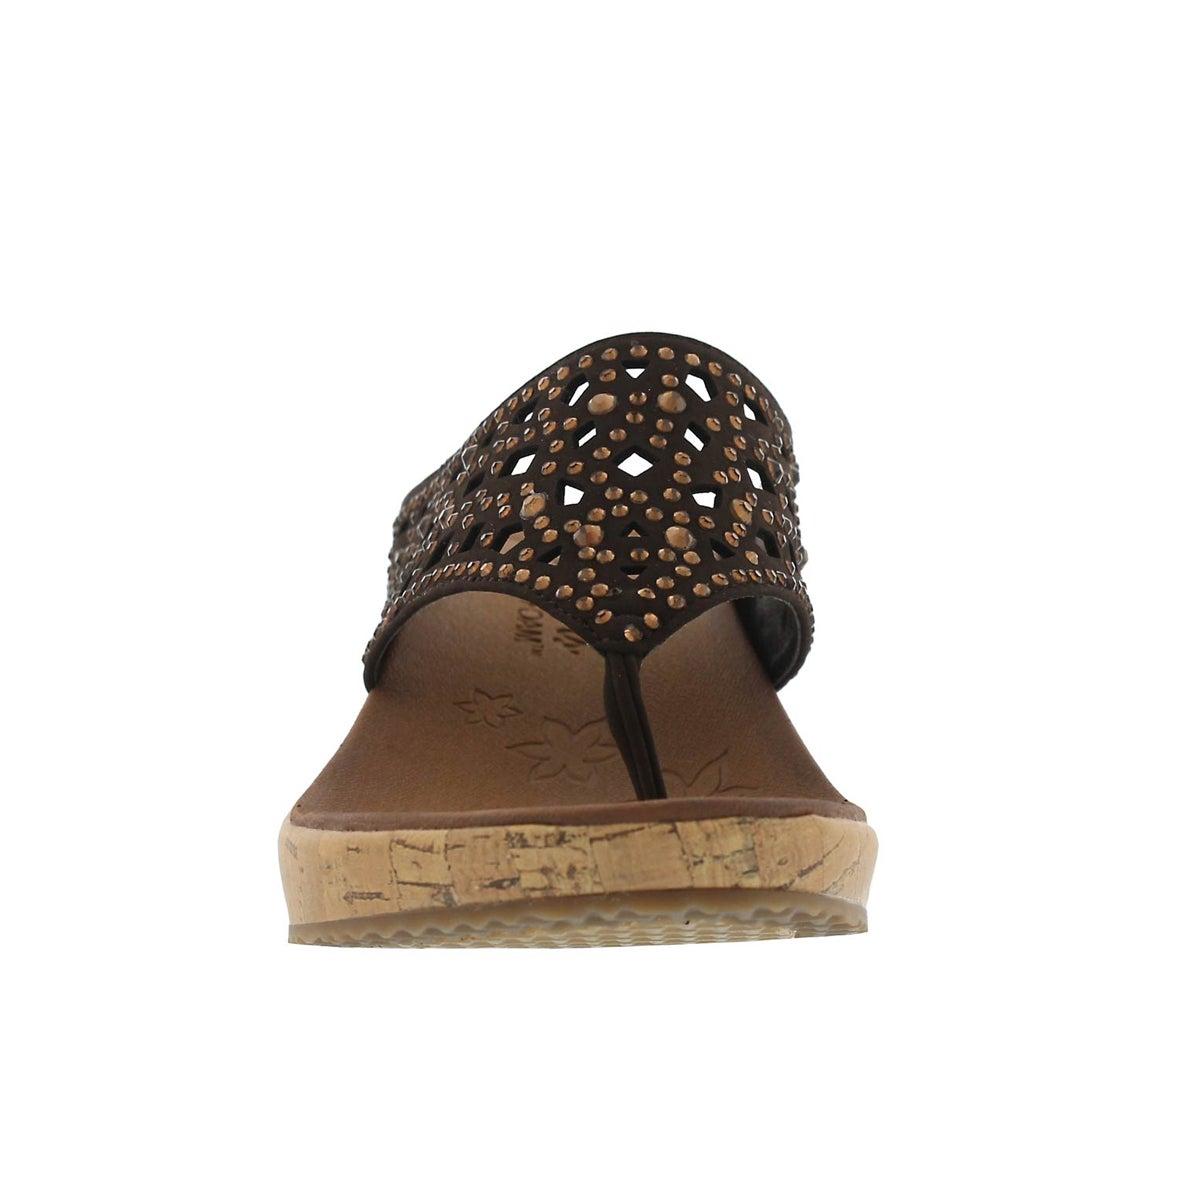 Women's BEVERLEE DAZZLED choc thong wedge sandals